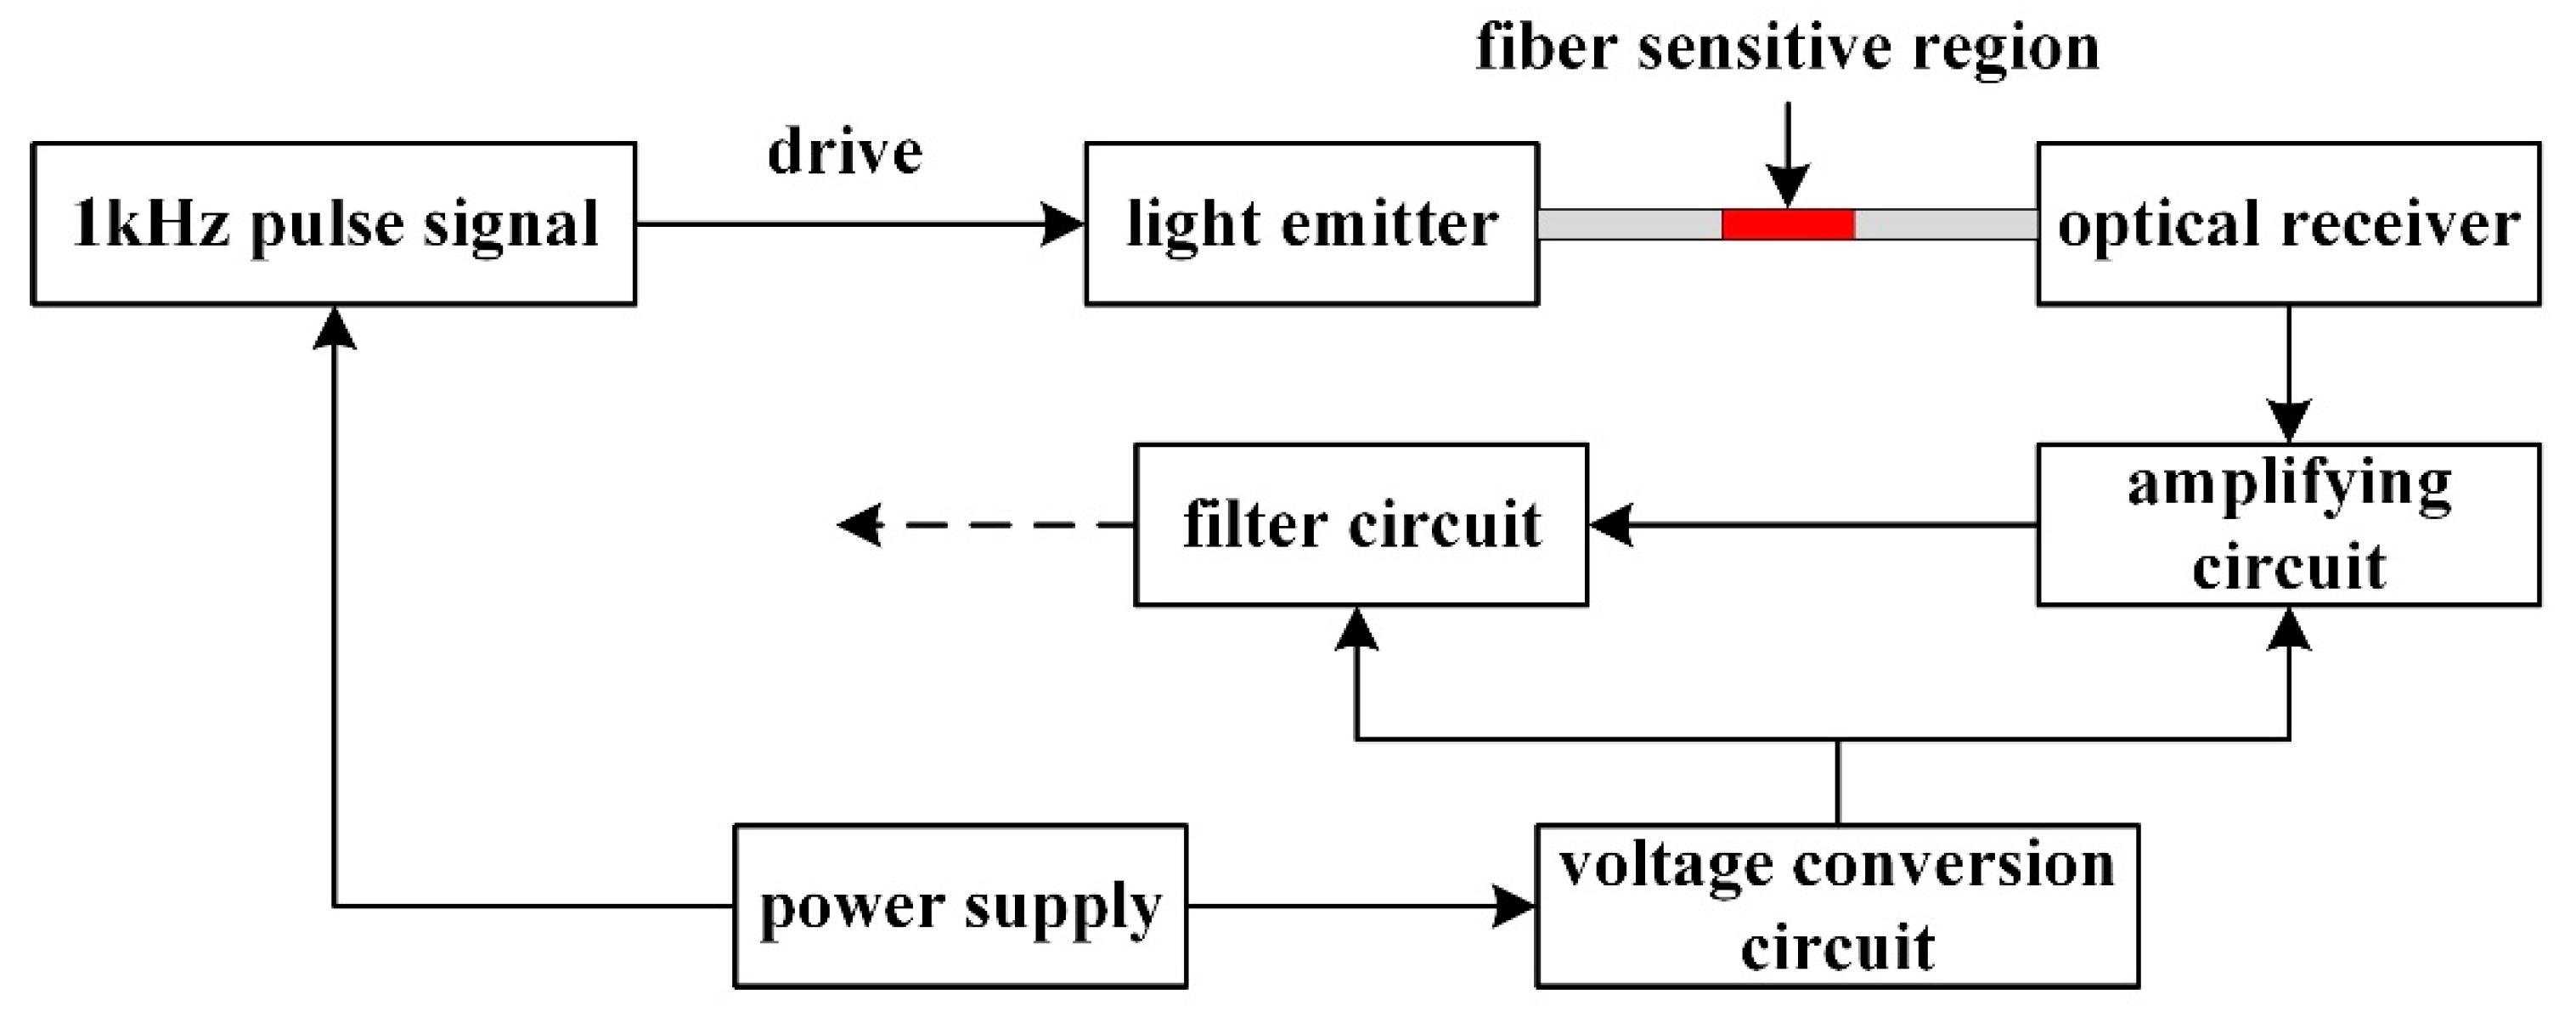 sensors free full text research on optical fiber sensor based on